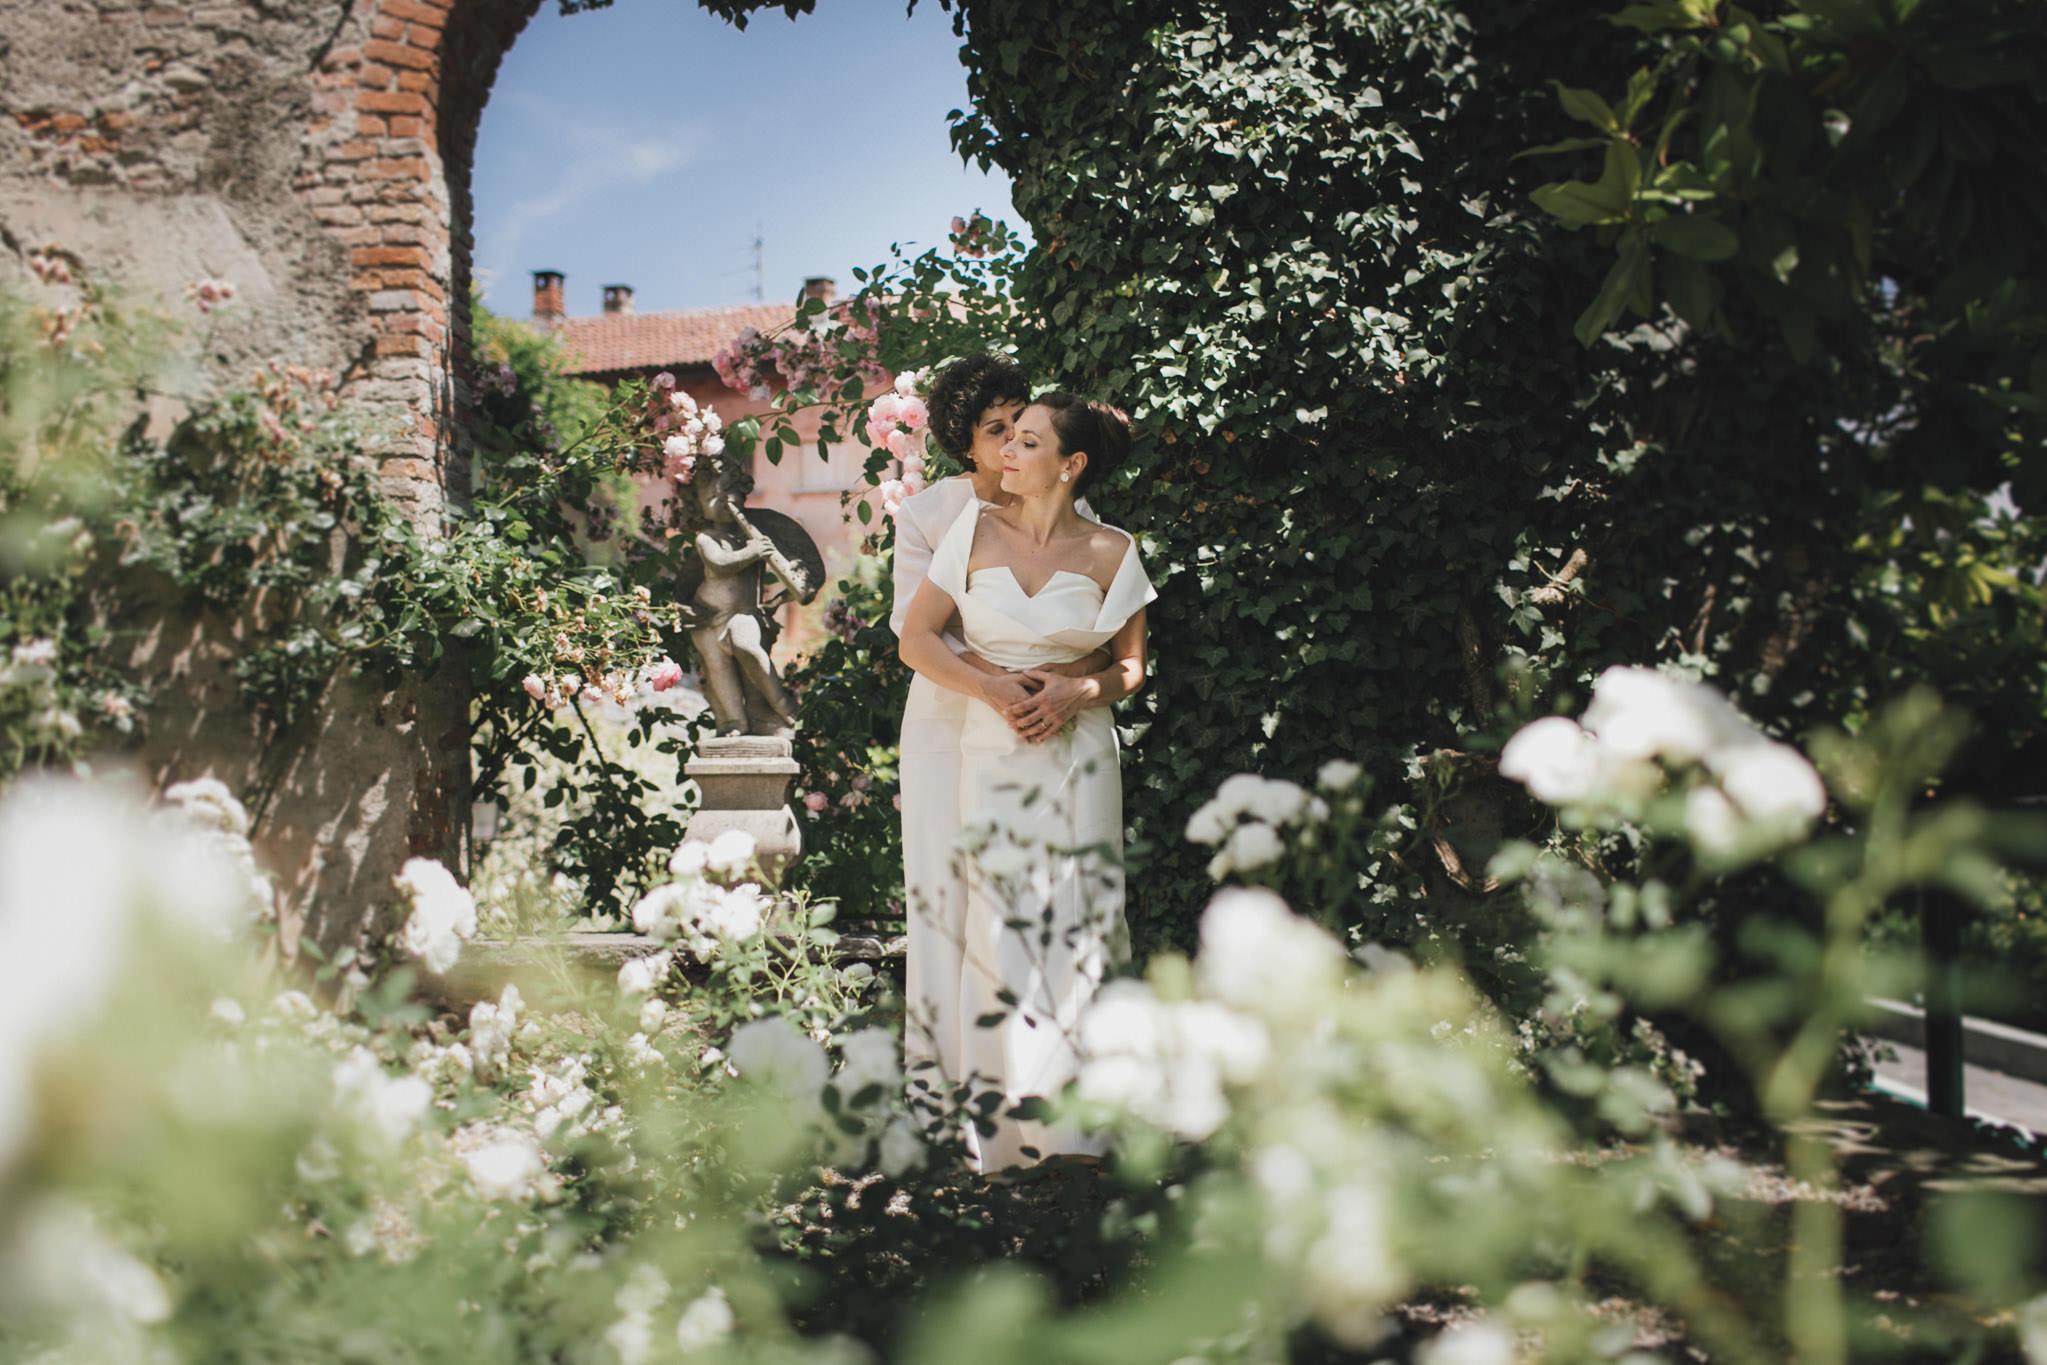 fotografia_di_matrimonio_portfolio-1003